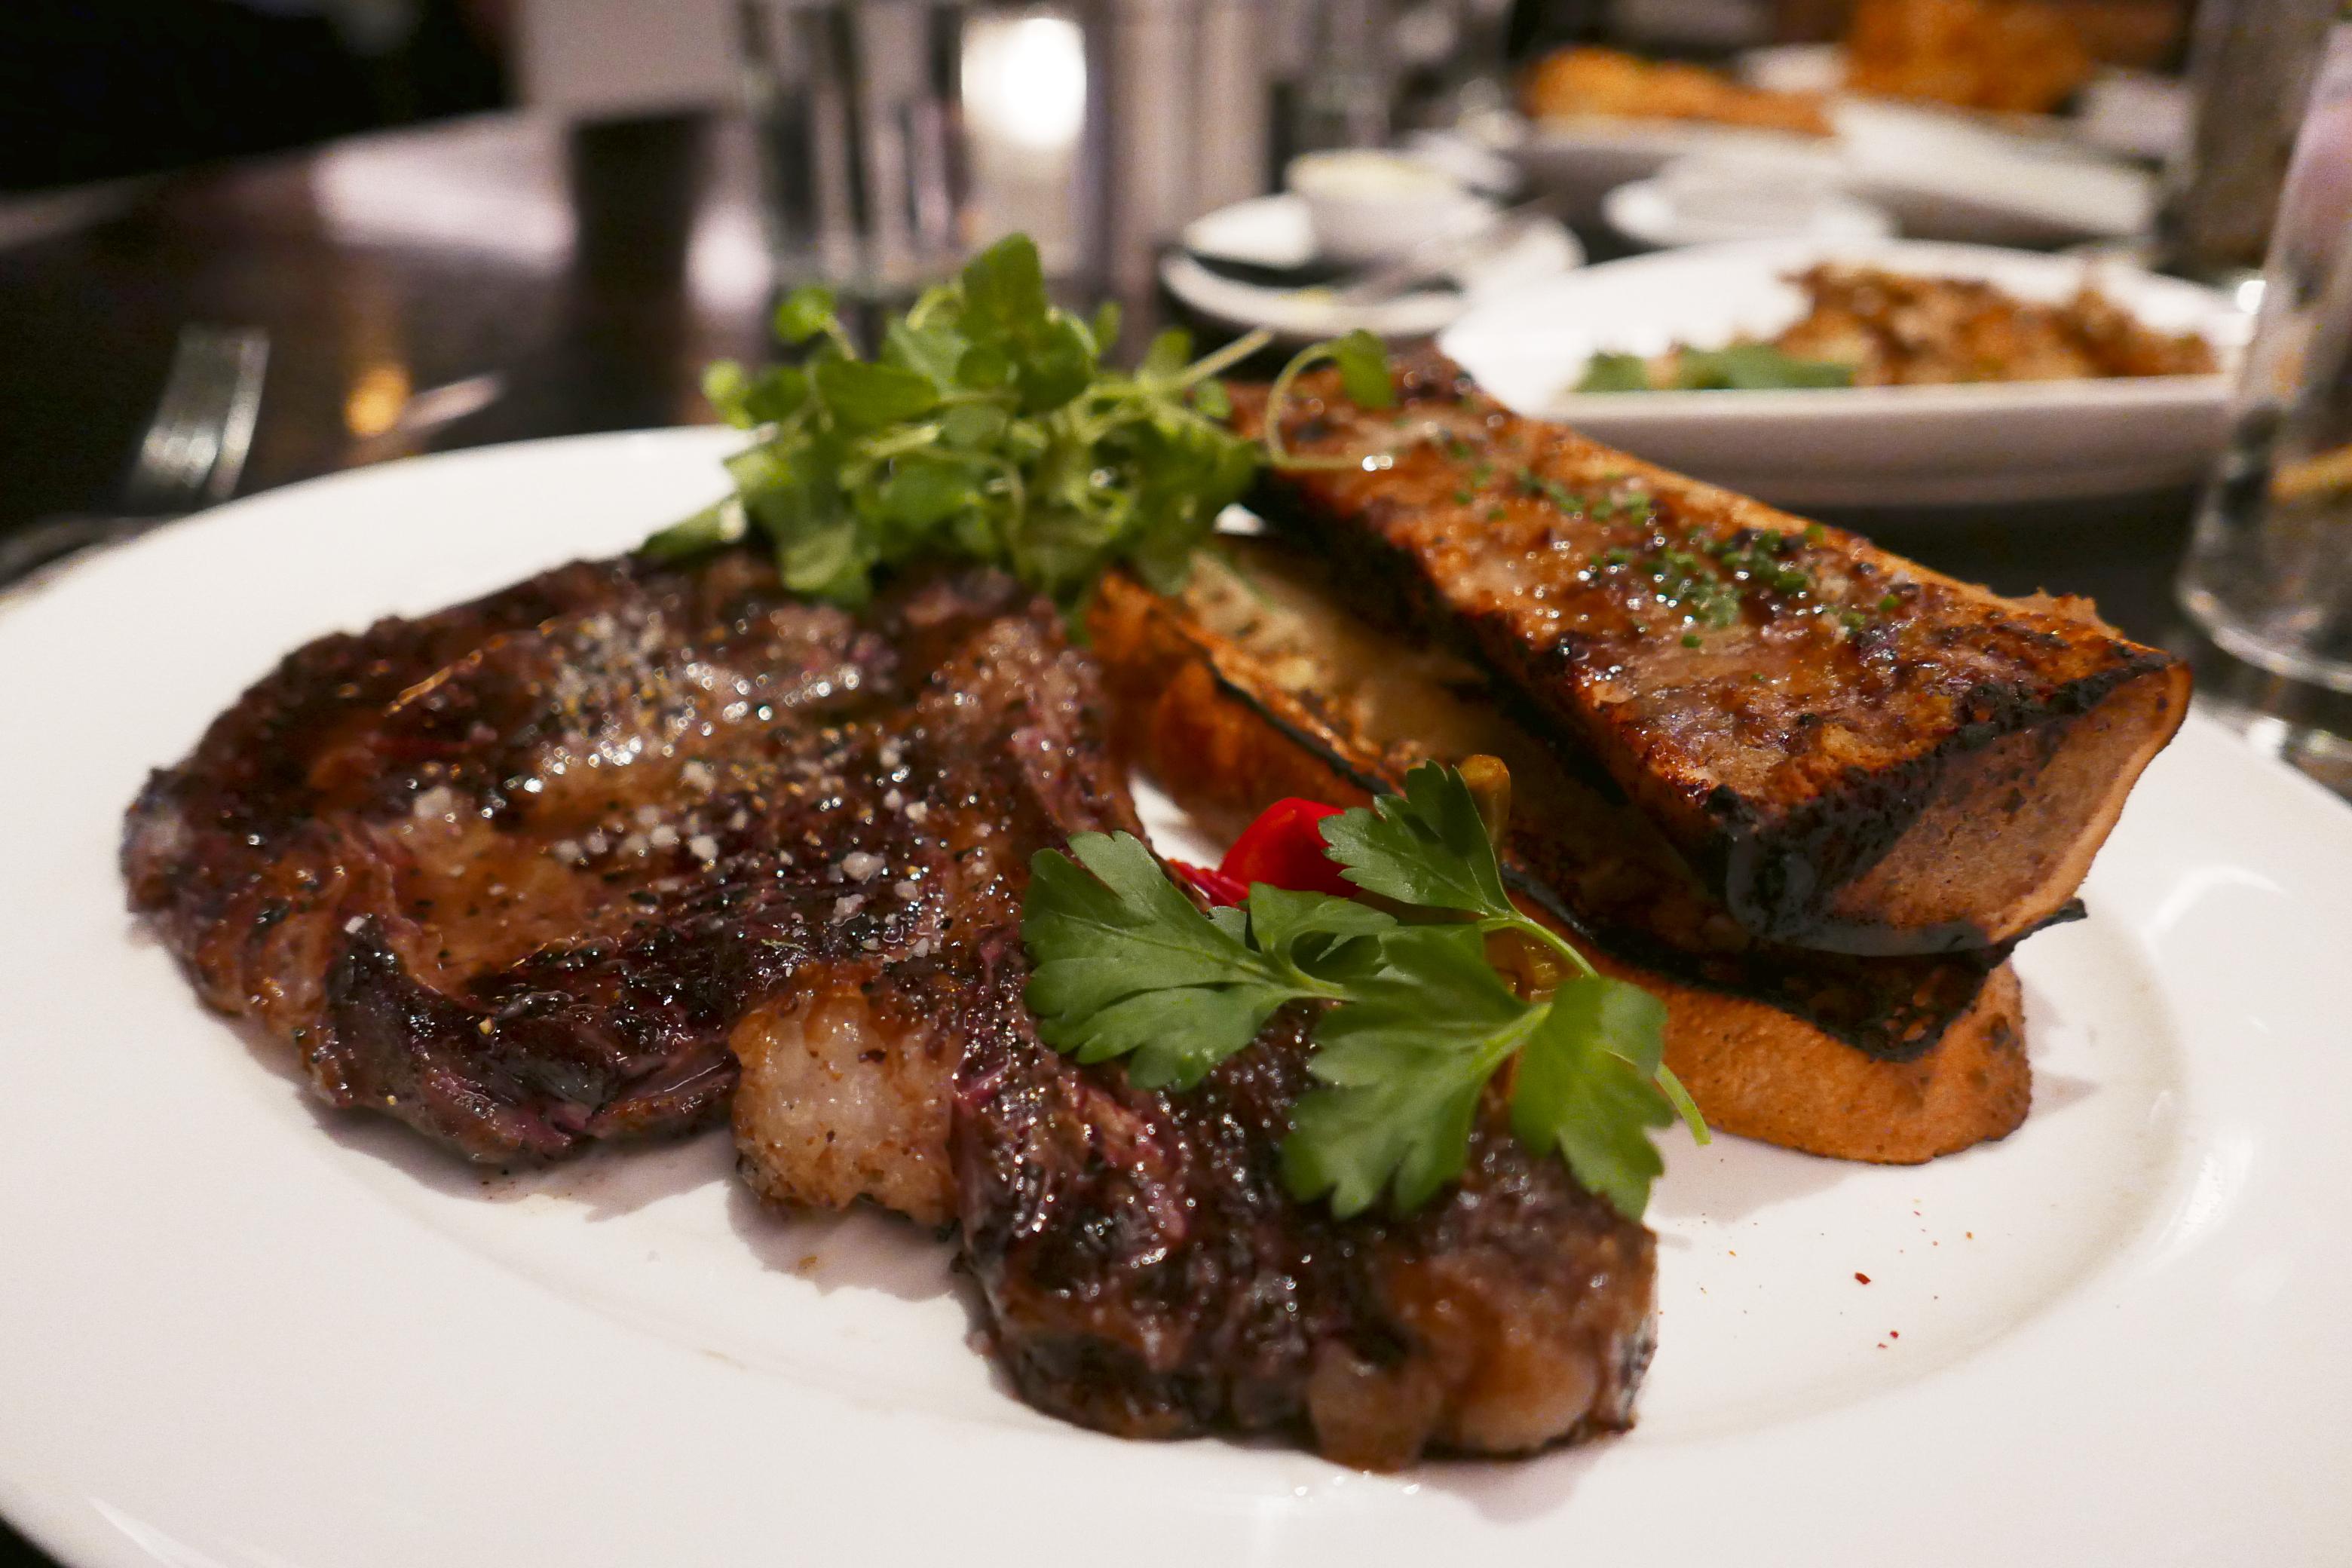 Delicious Destinations Las Vegas - Wagyu beef steak with bone marrow